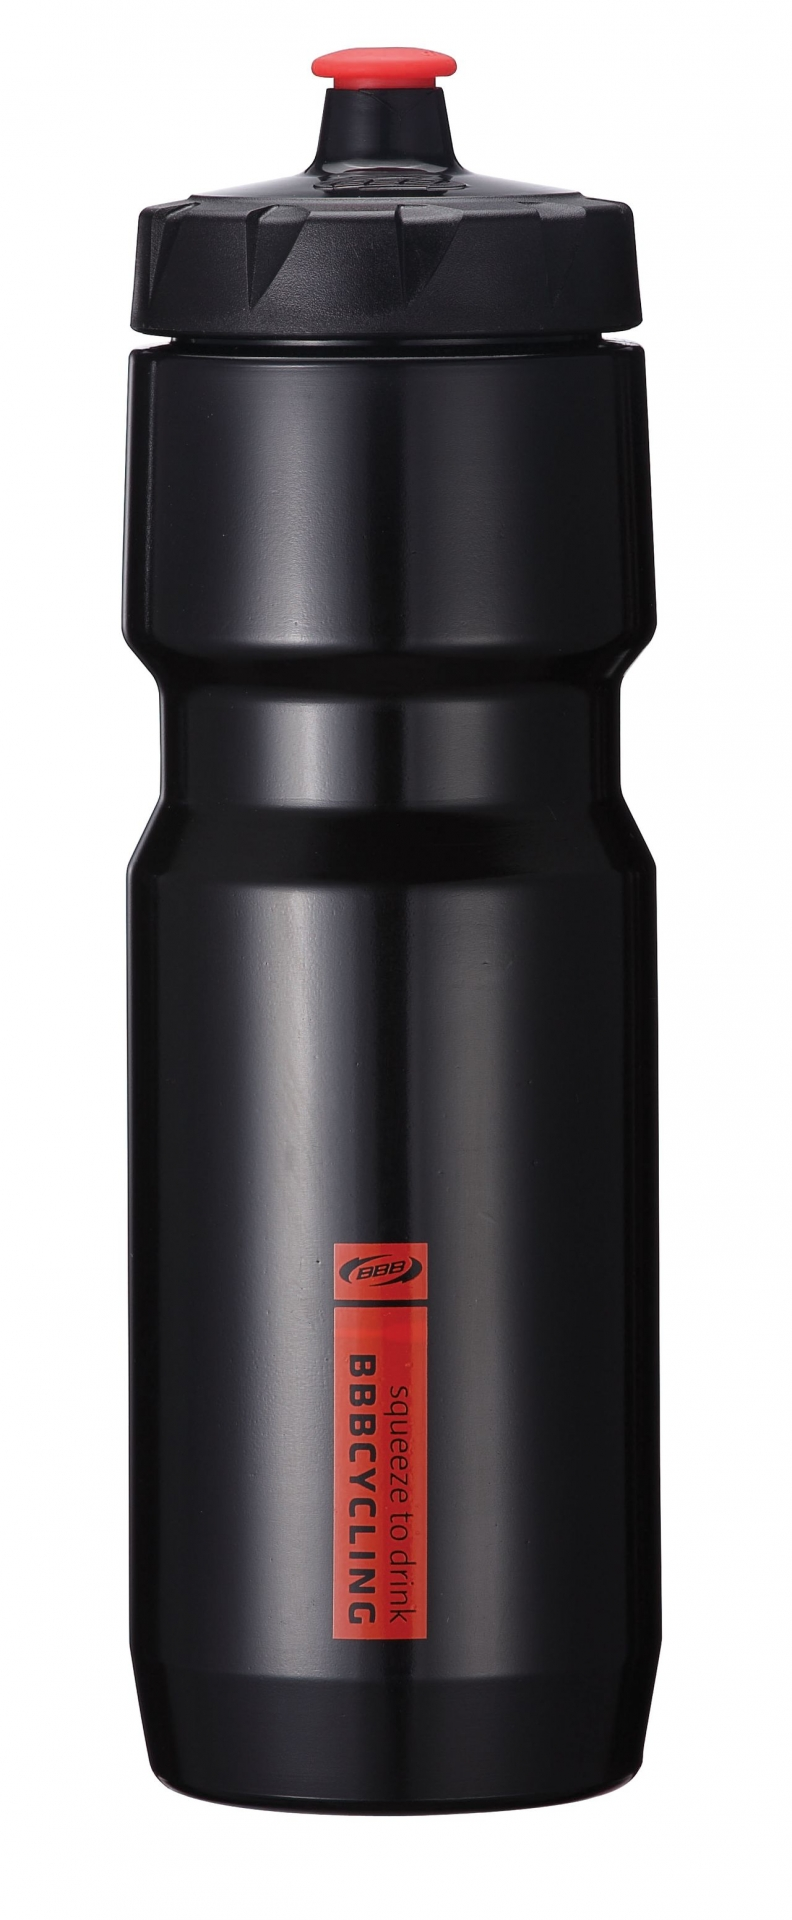 Bidon BBB CompTank 750 ml (noir/rouge) - BWB-05